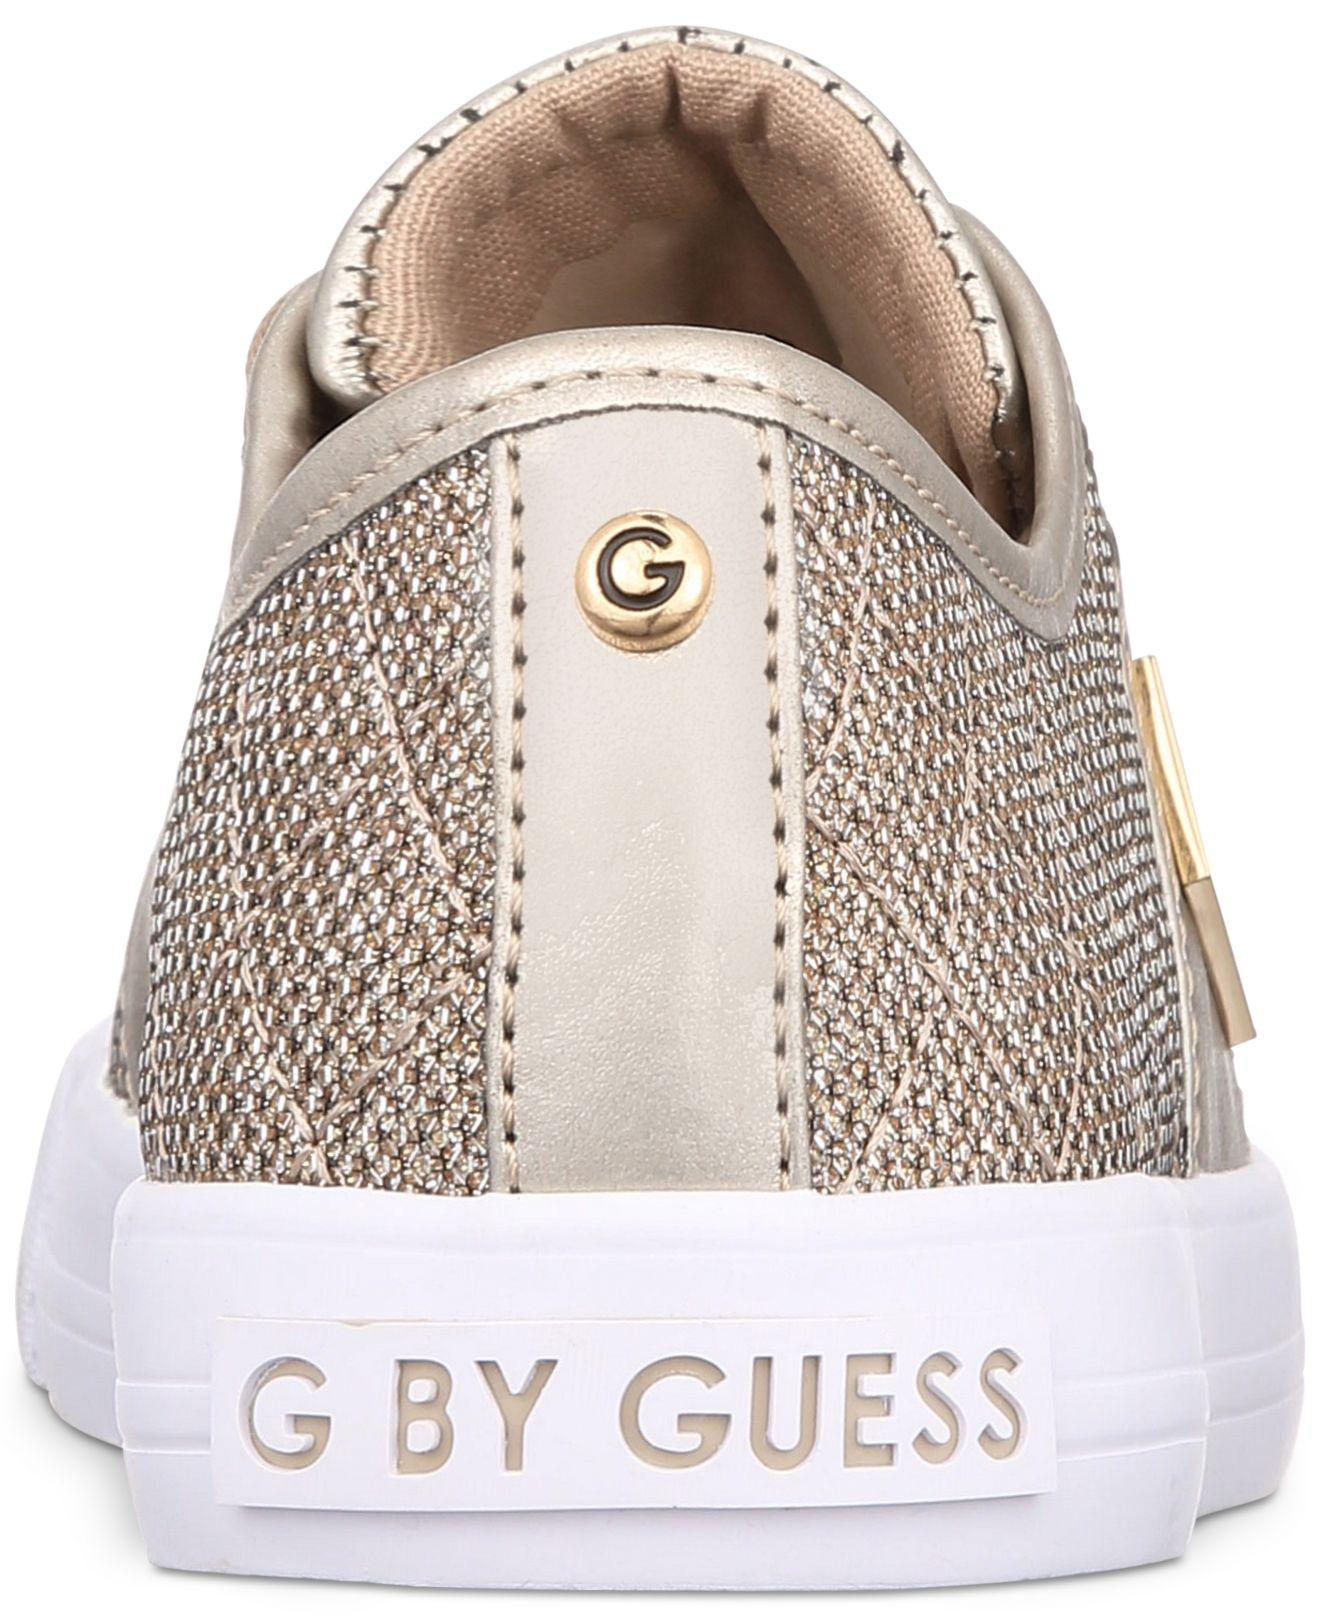 548f6ee8ac8 Lyst - G by Guess Backer Sneakers in Metallic